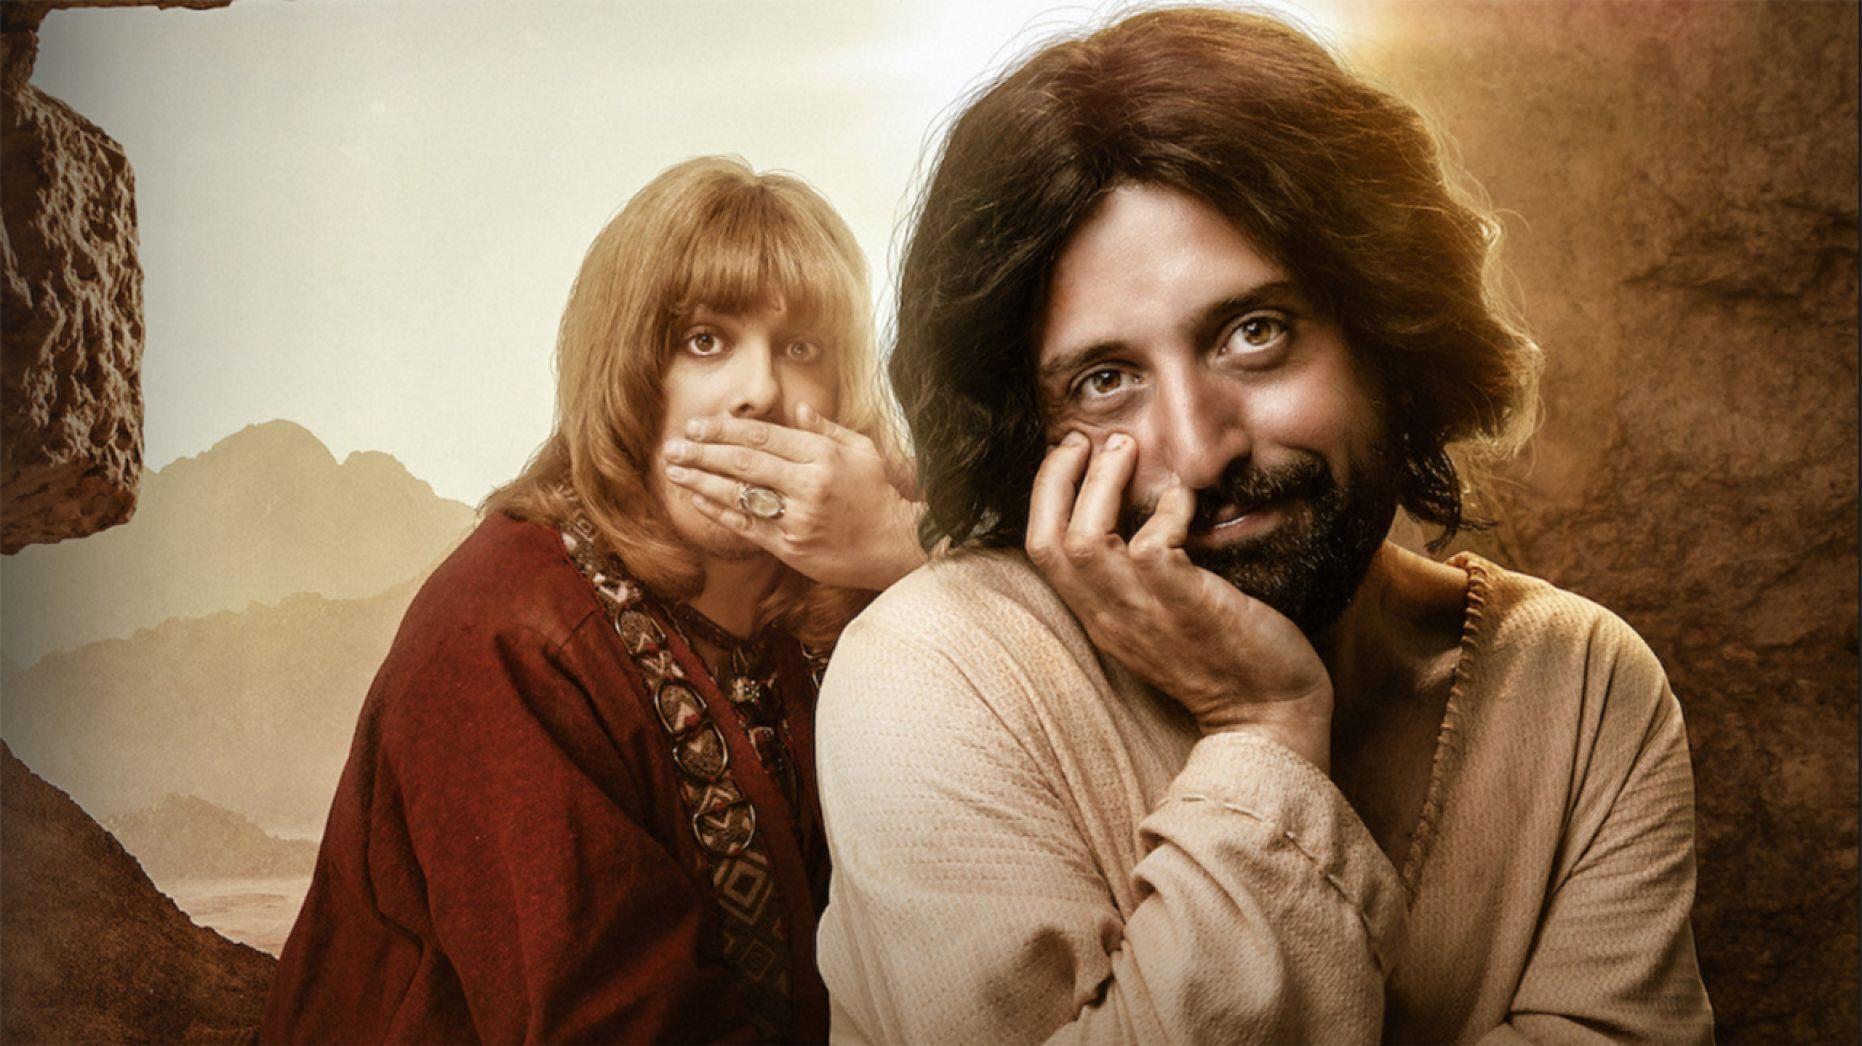 The-First-Temptation-of-Christ-Netflix